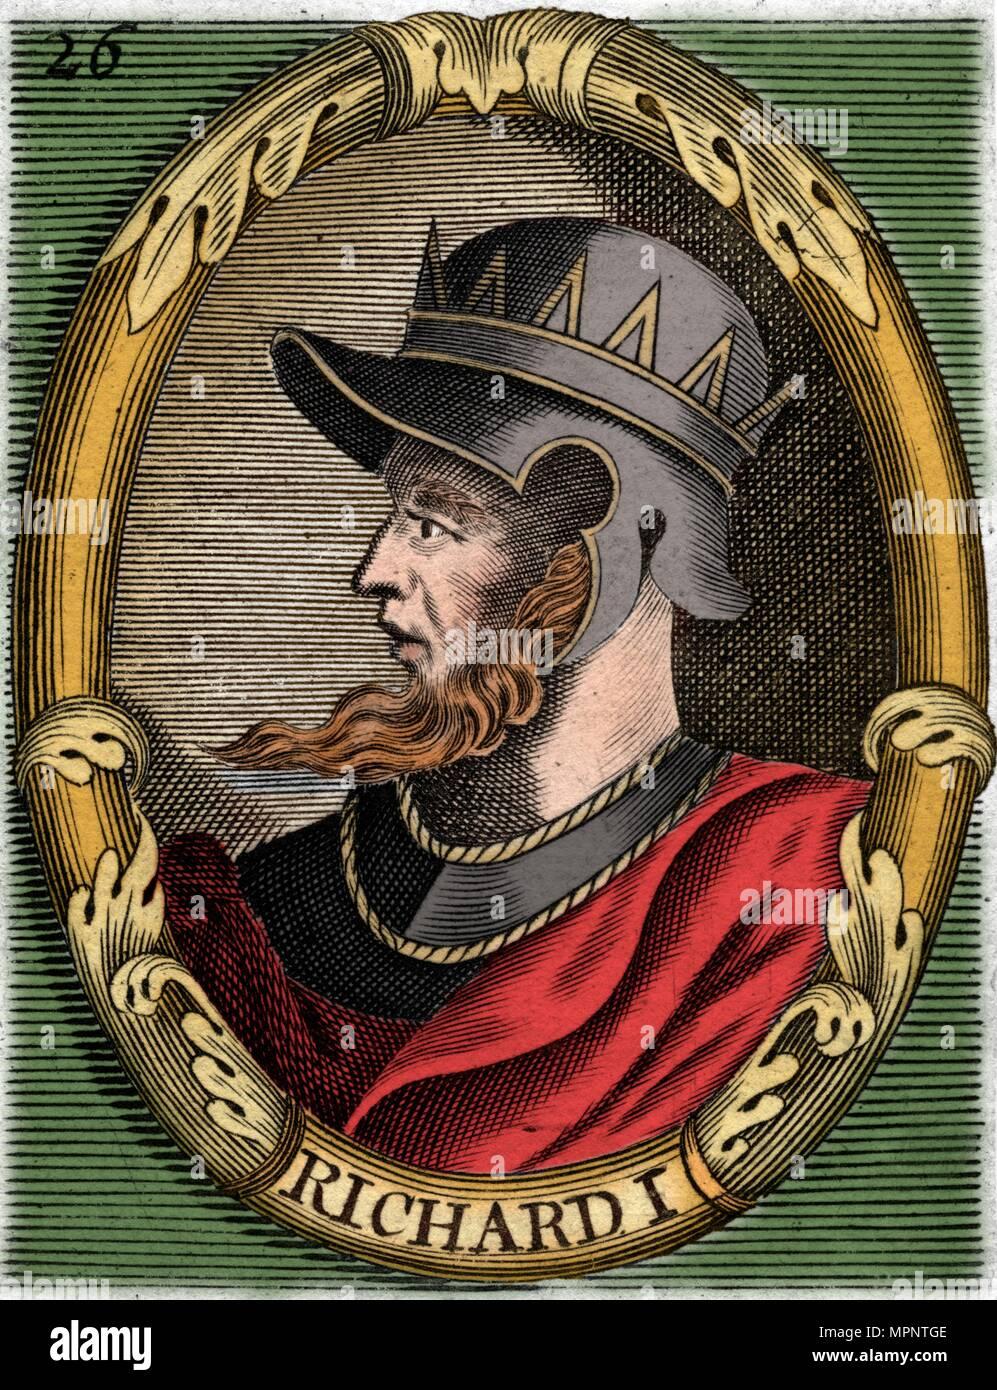 Richard I, King of England. Artist: Unknown. - Stock Image